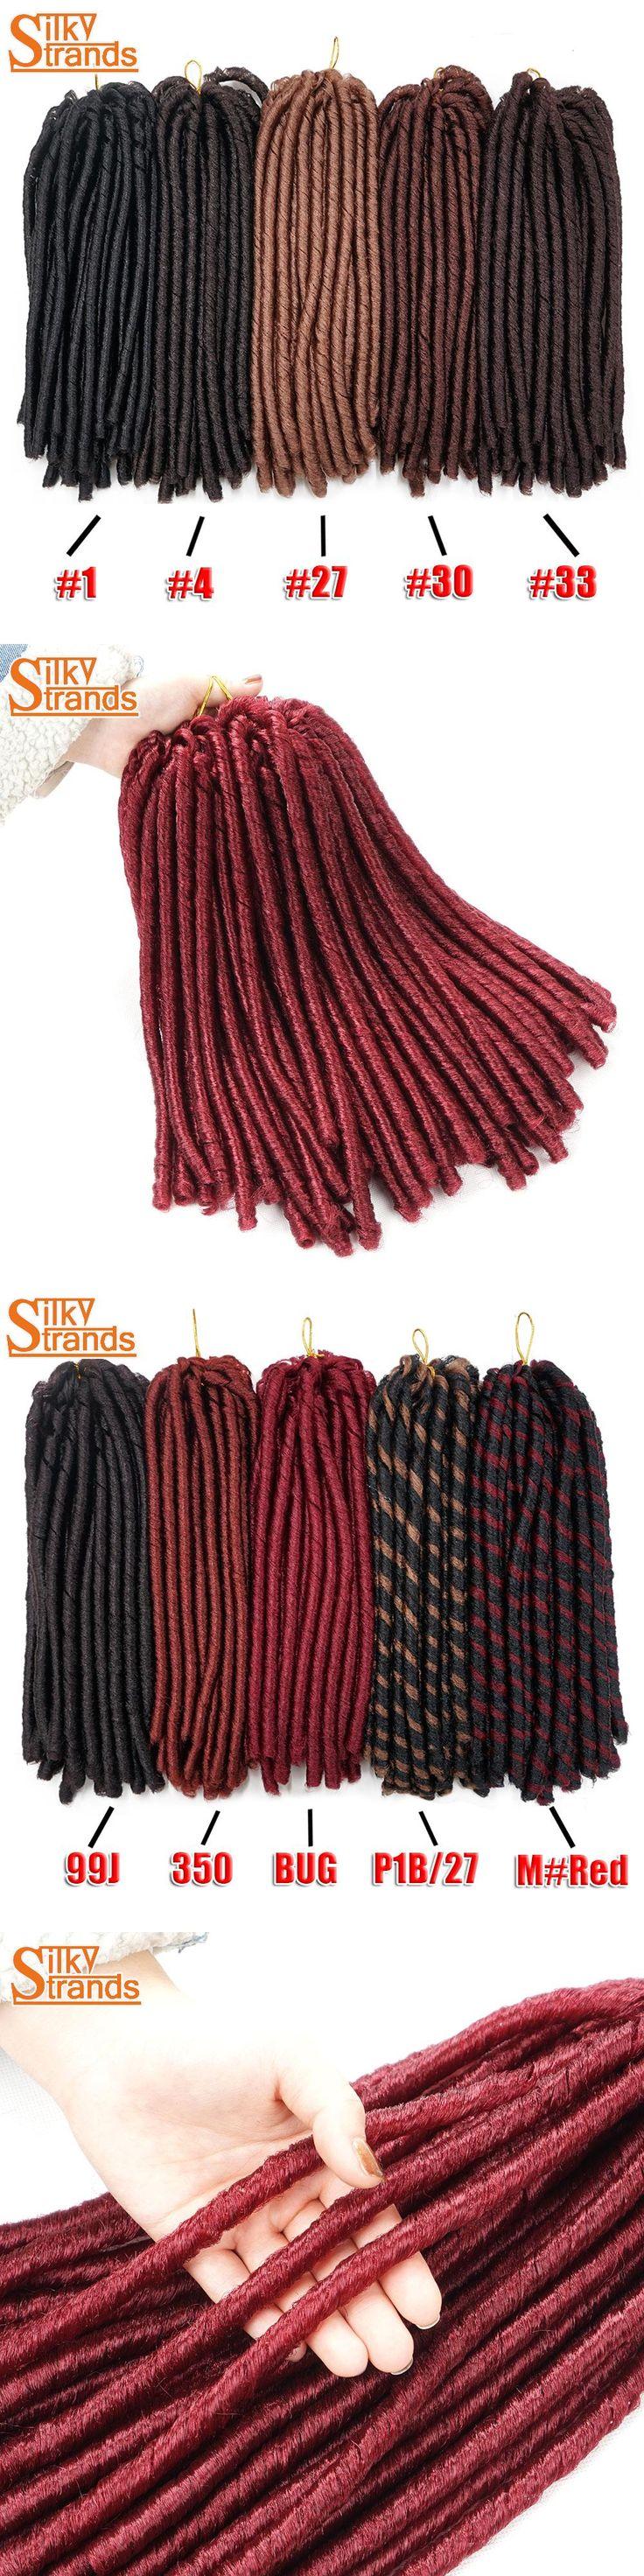 Silky Strands Crochet Dreadlocks Hair Extensions Crochet Braids Hair Soft Dread Kanekalon Synthetic Hair For Braids Bulk Colors